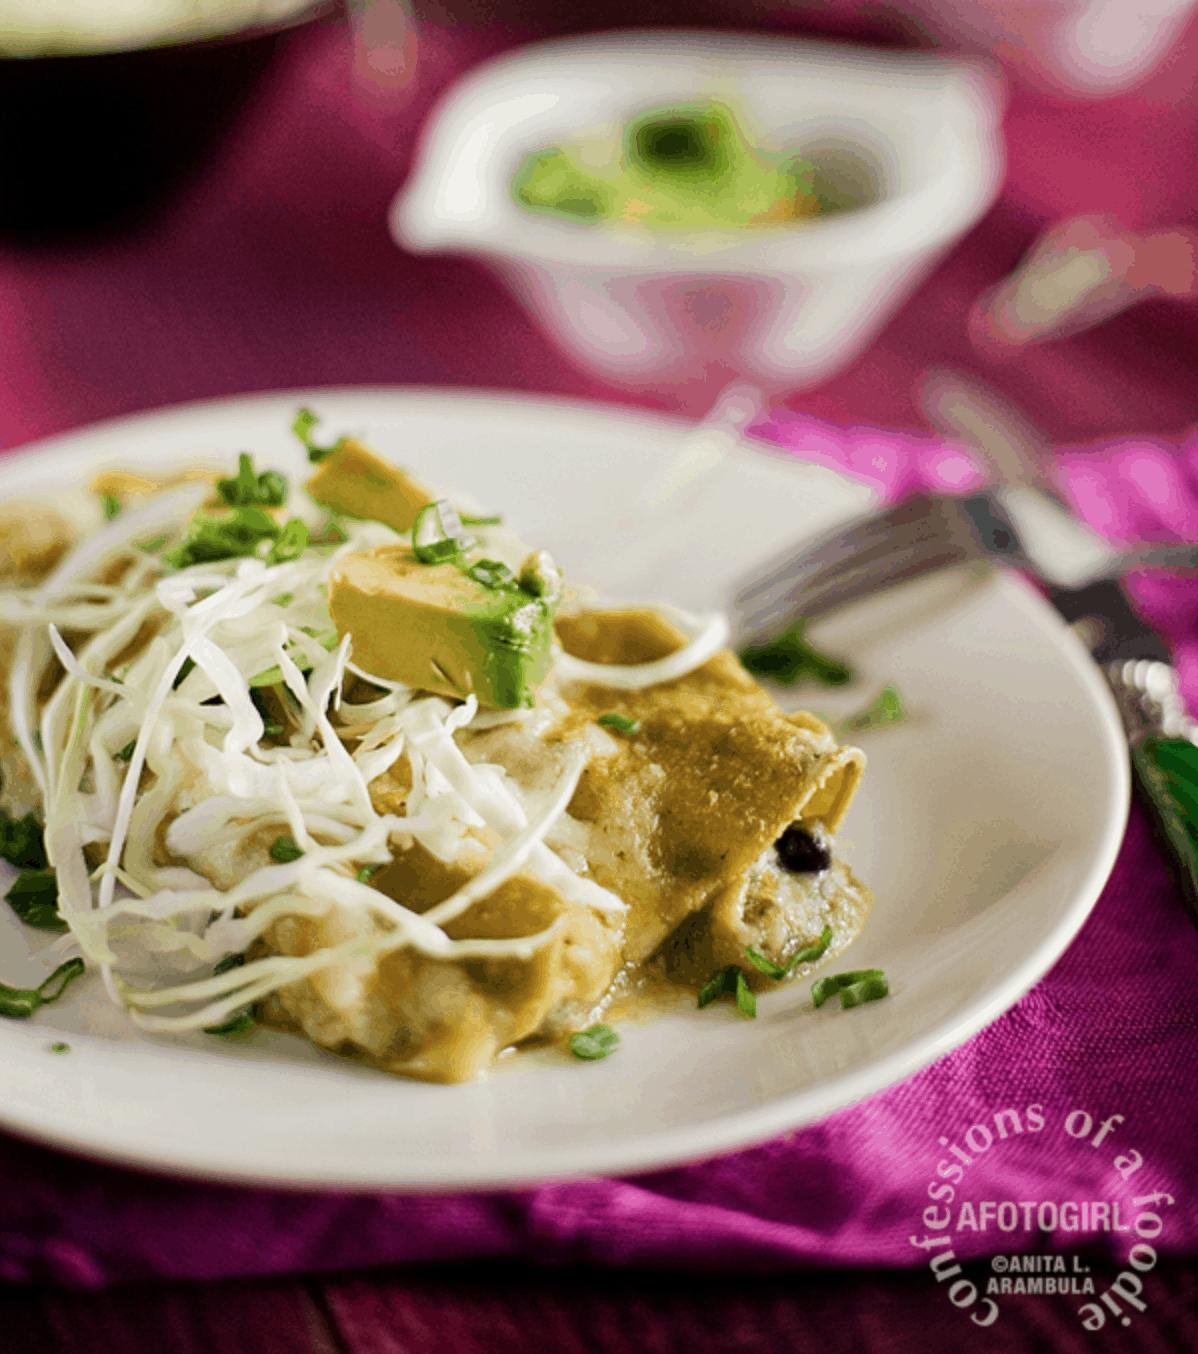 https://www.confessionsofafoodie.me/2013/03/easy-black-bean-enchiladas.html